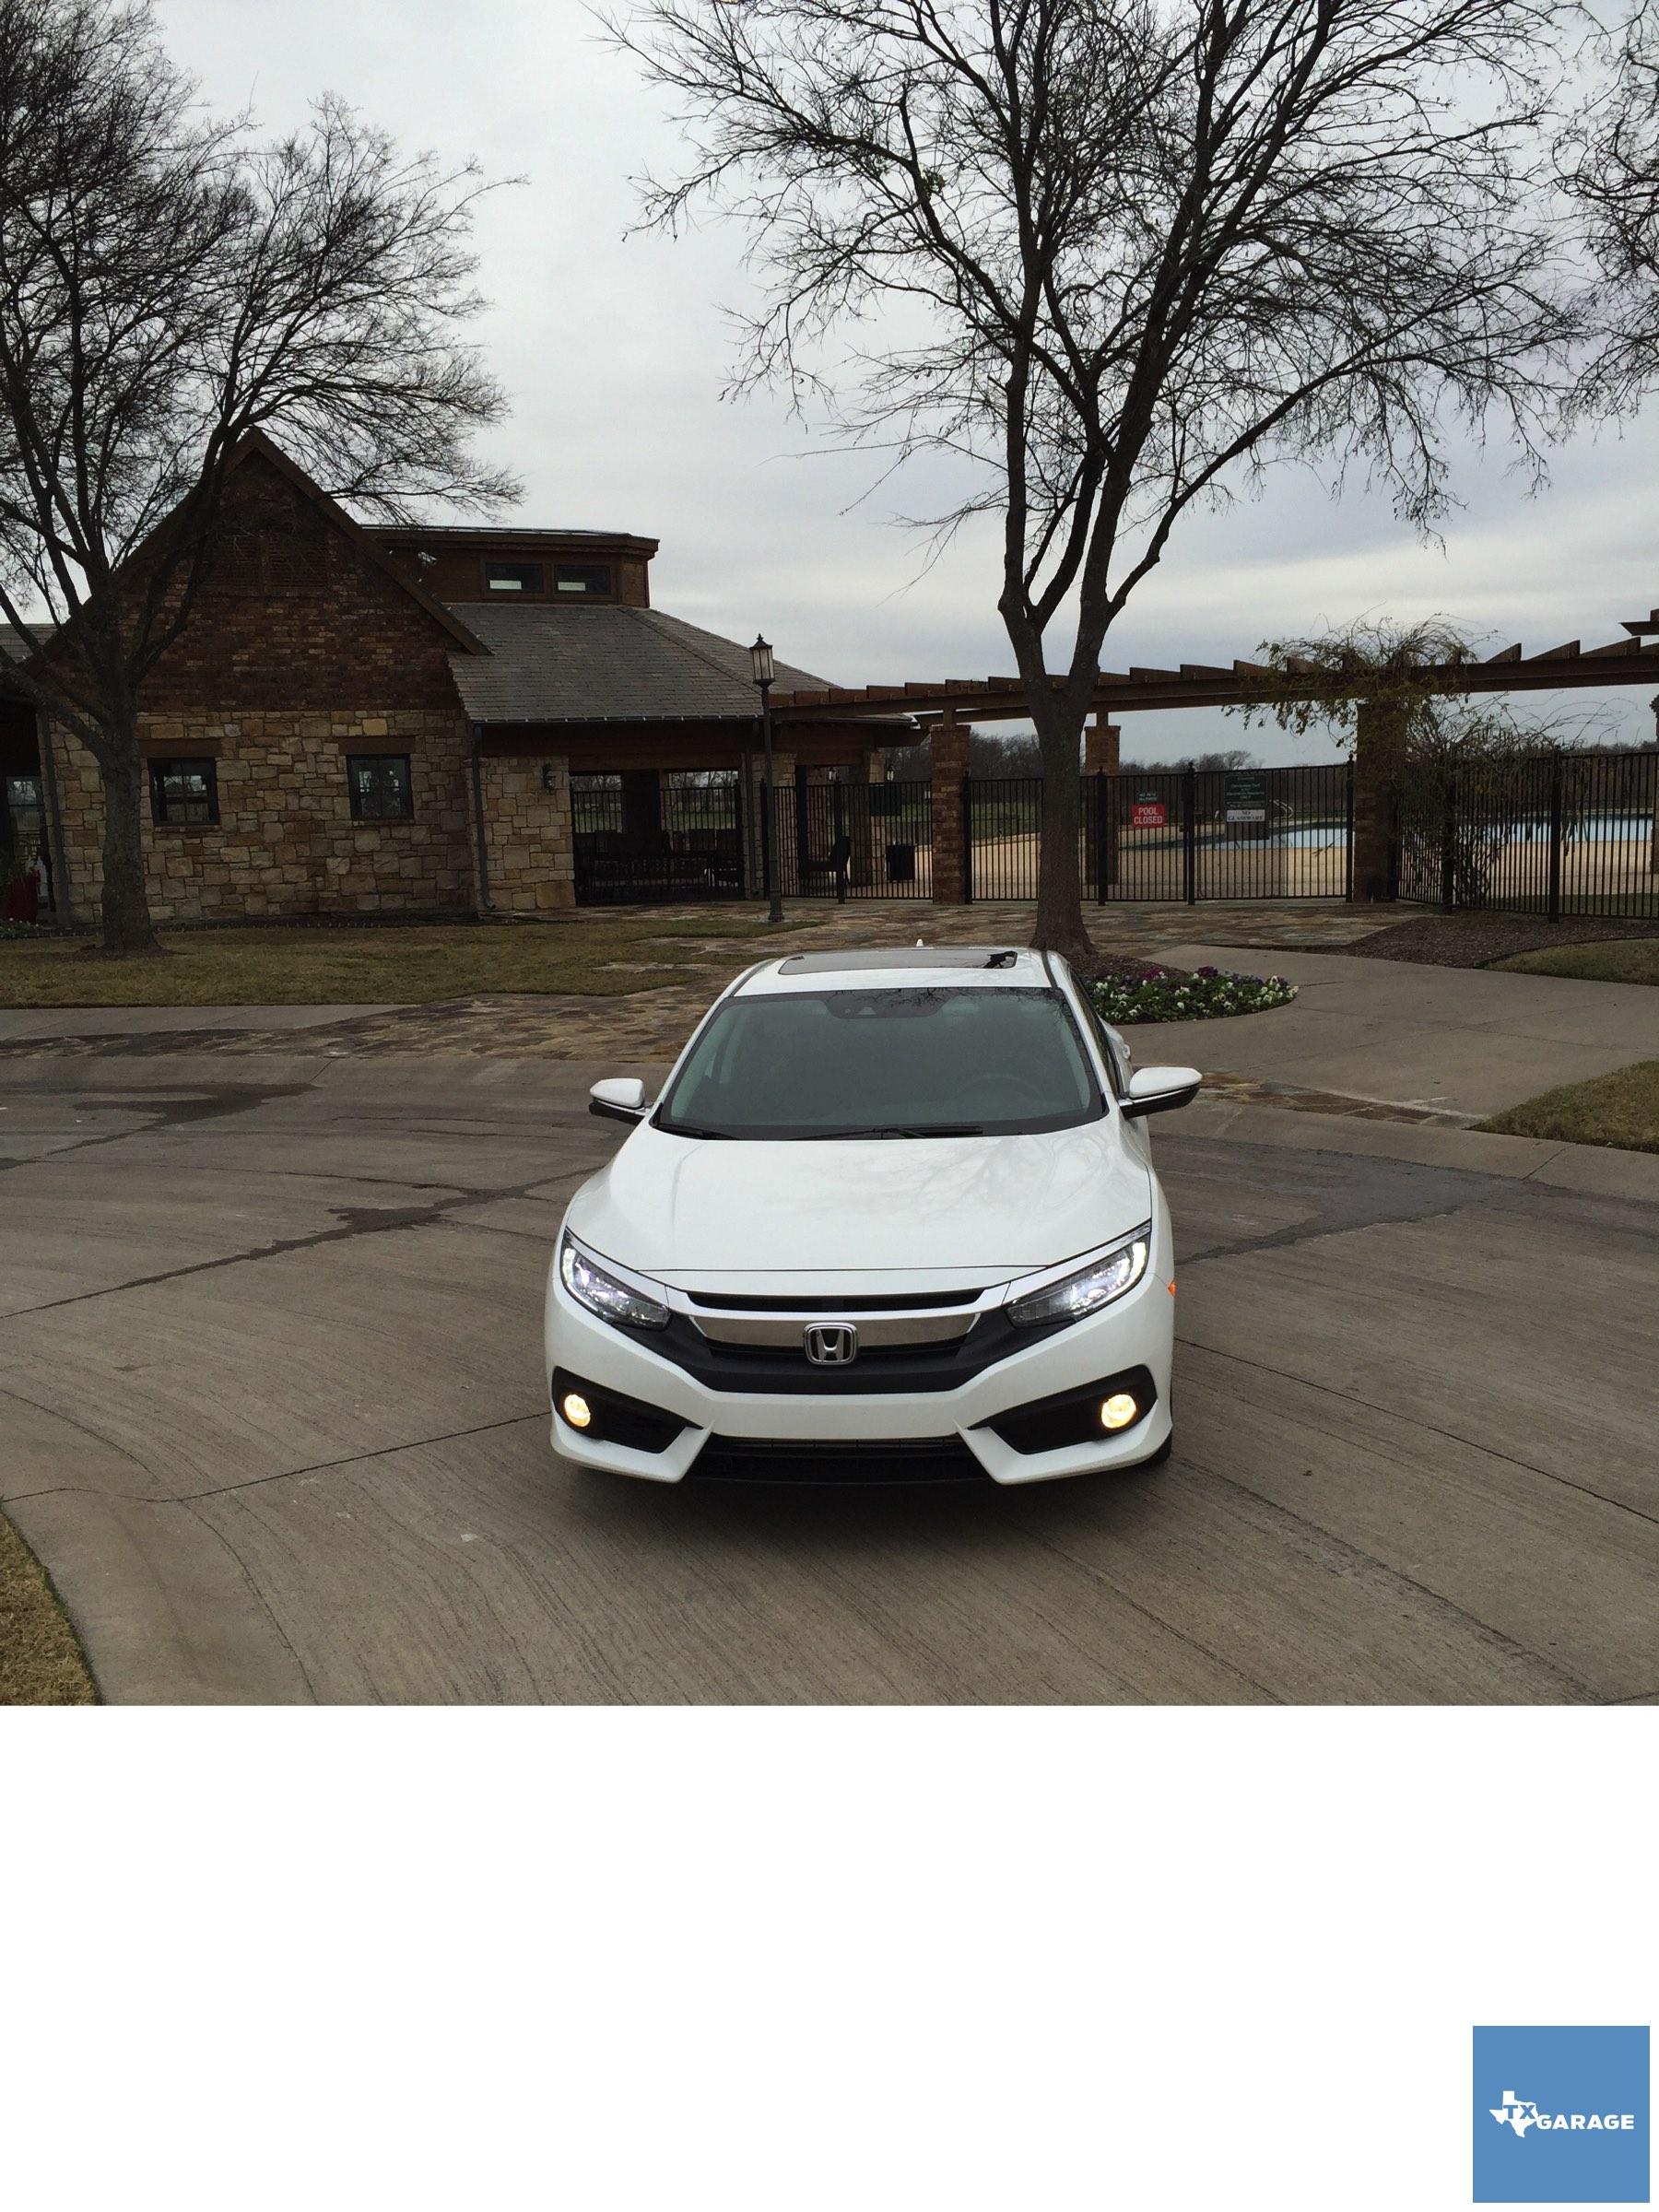 2016-Honda-Civic-by-txGarage-011